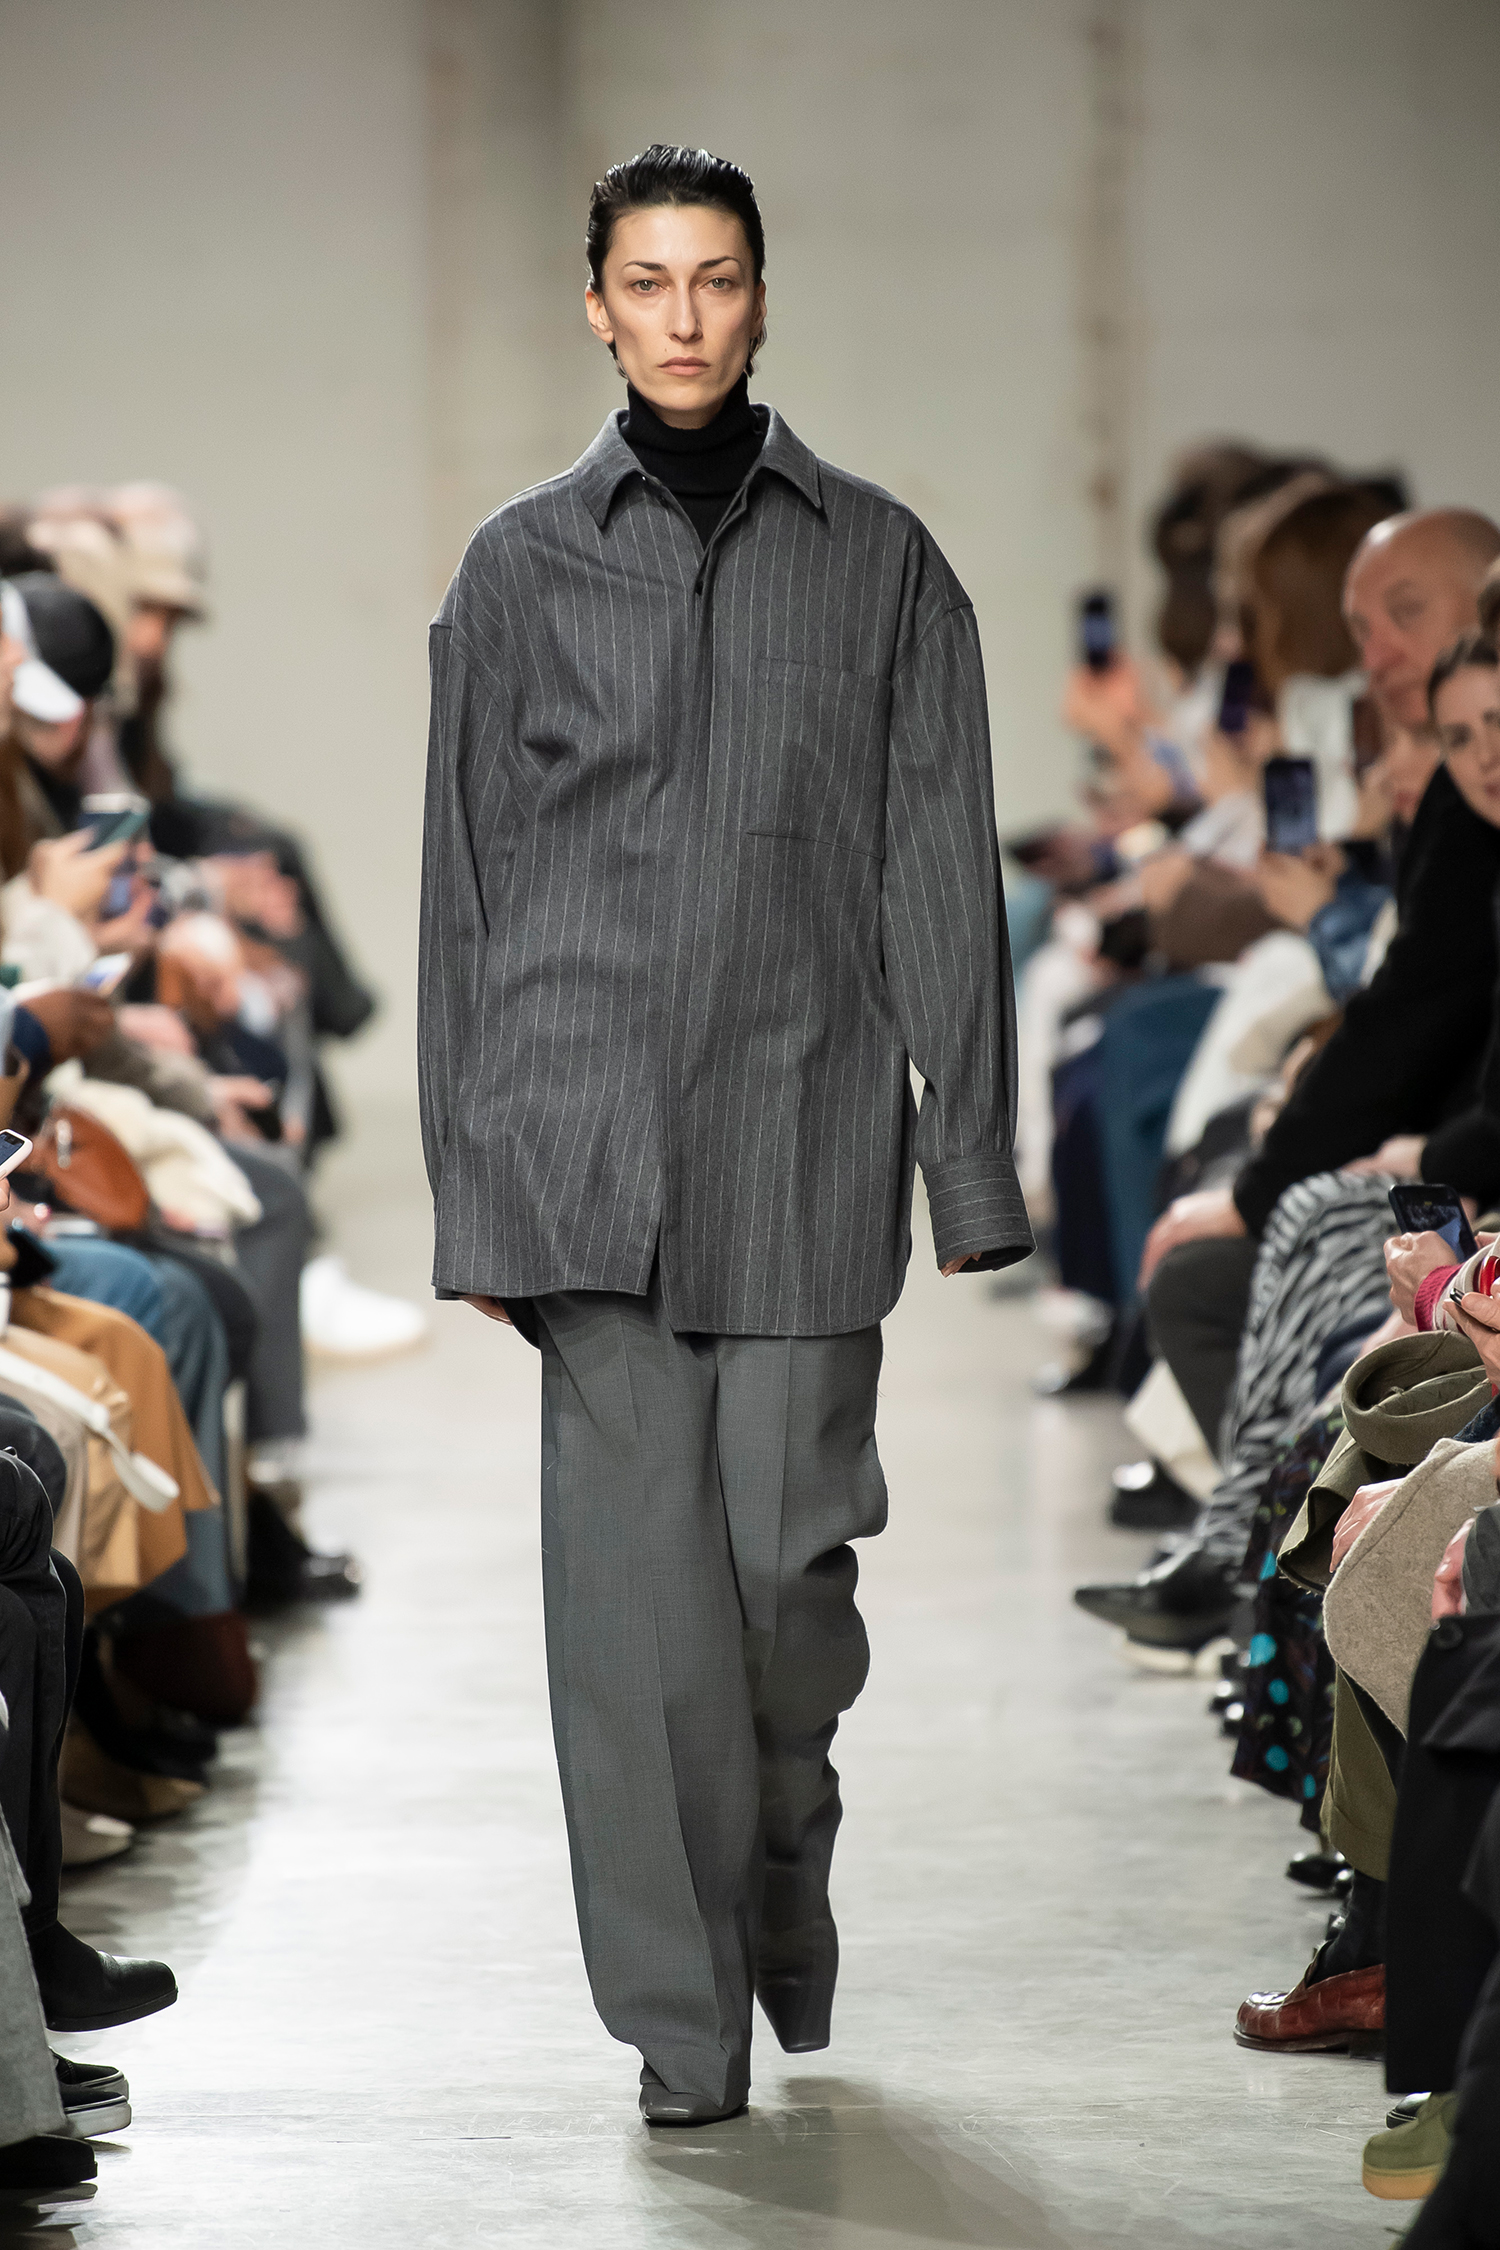 LOOK 31 Shirt RU Knitwear RESITA Trousers RIVKA